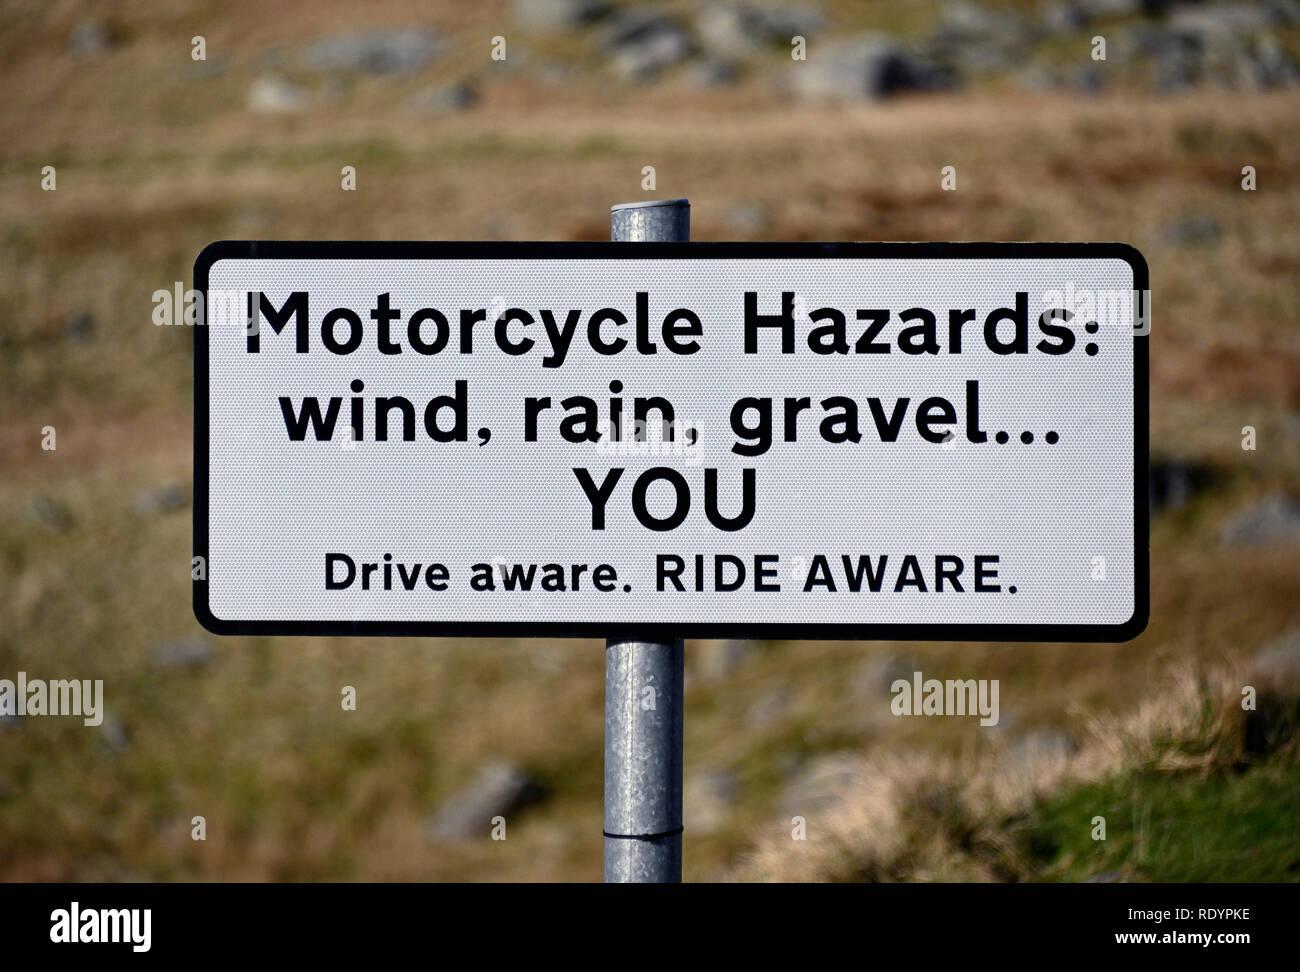 Warning road sign. 'Motorcycle Hazards: wind, rain, gravel...YOU Drive aware. RIDE AWARE.'   Kirkstone Pass, Cumbria, England, United Kingdom, Europe. - Stock Image